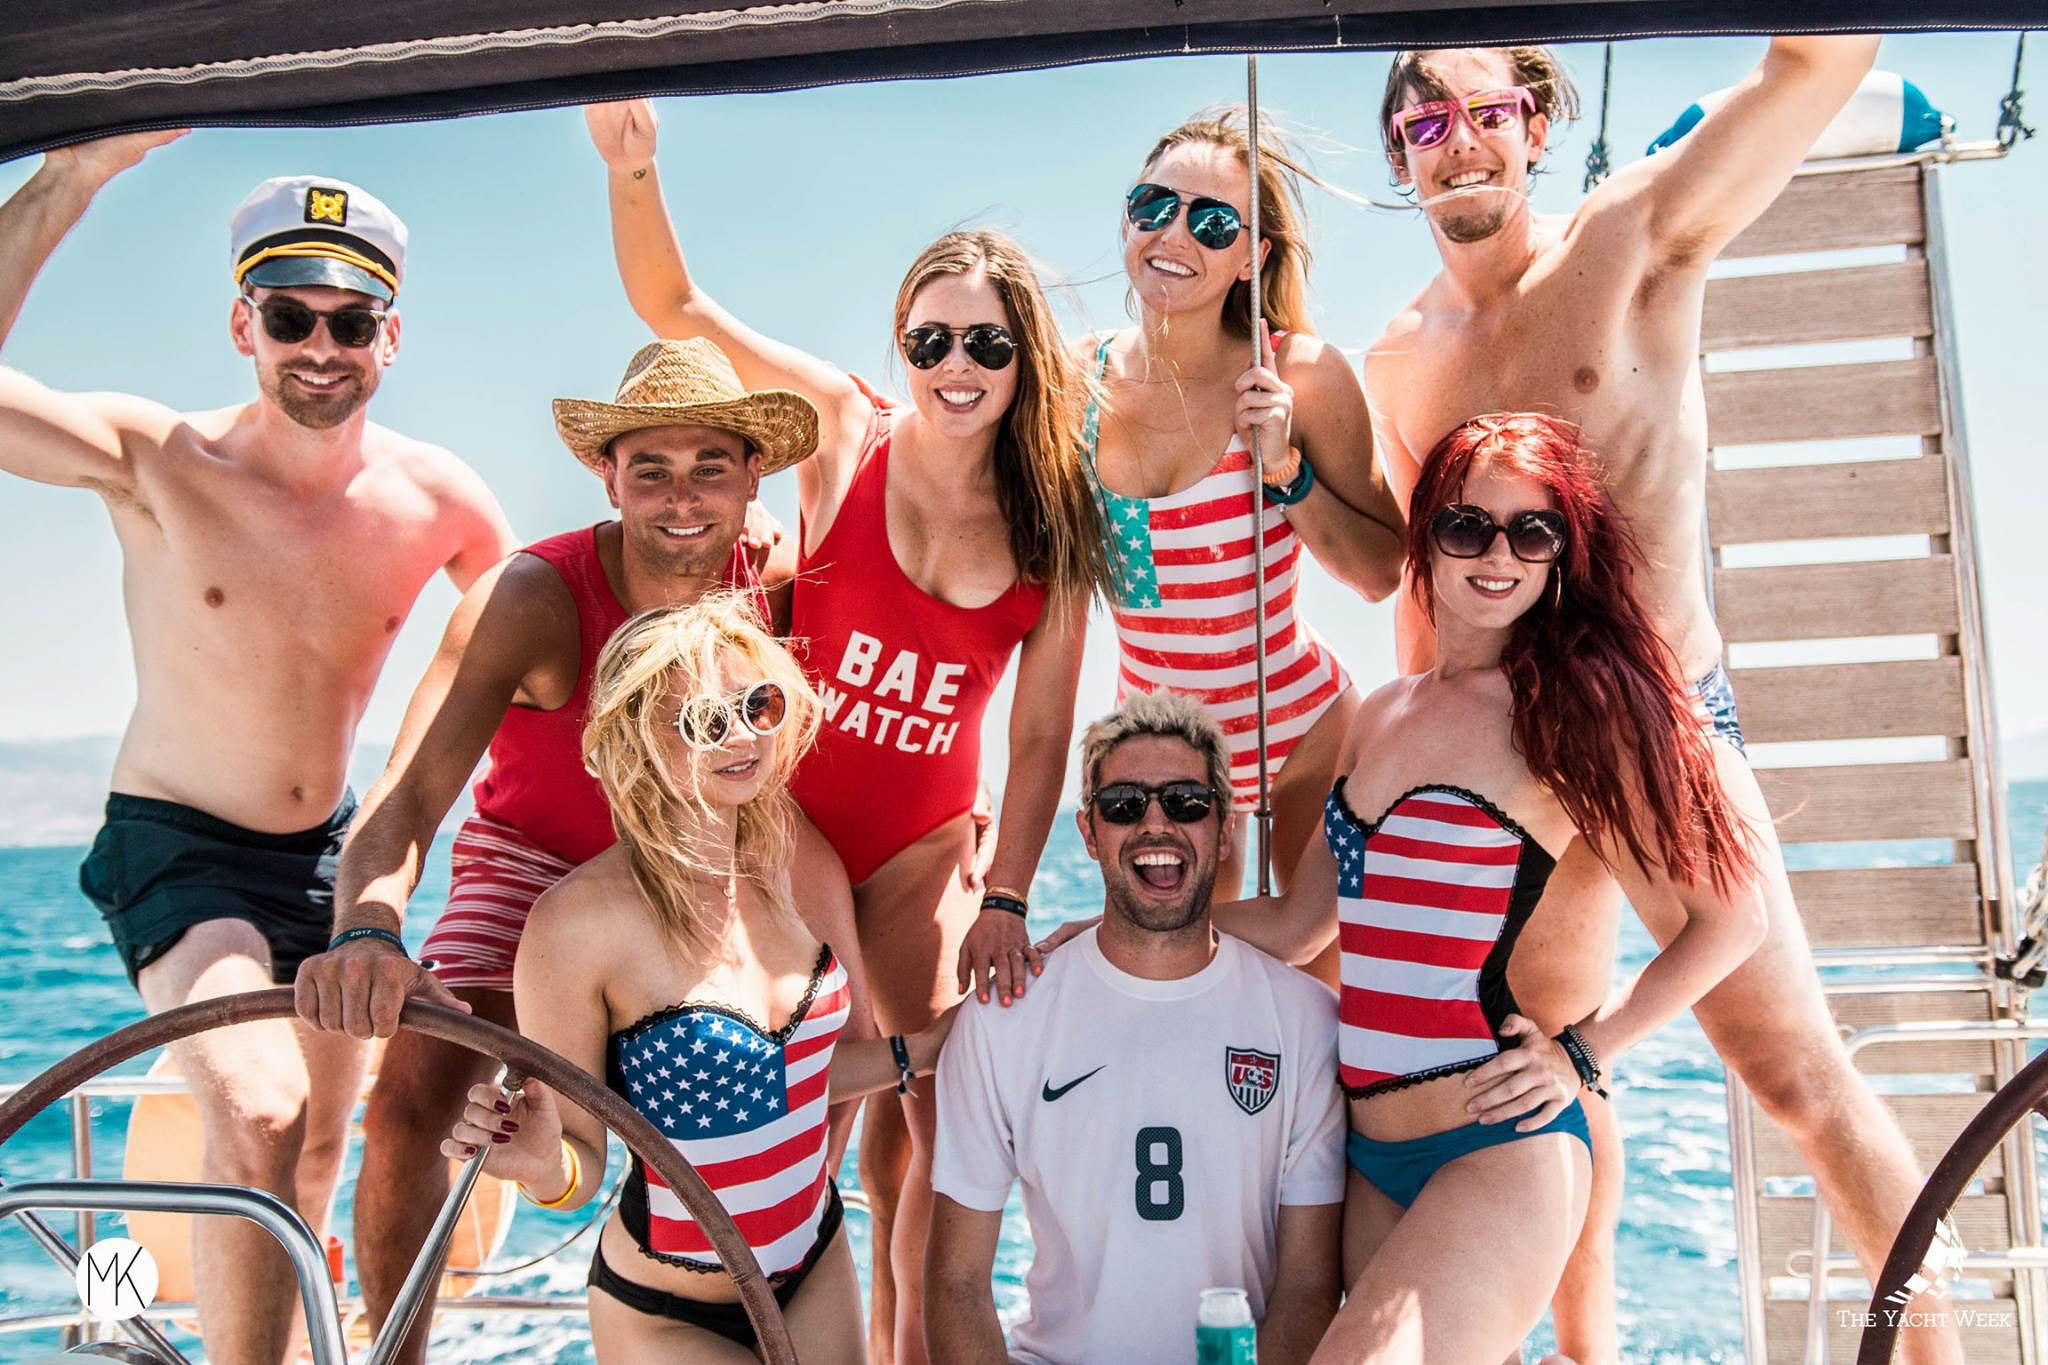 The Yacht Week regatta - American themed!